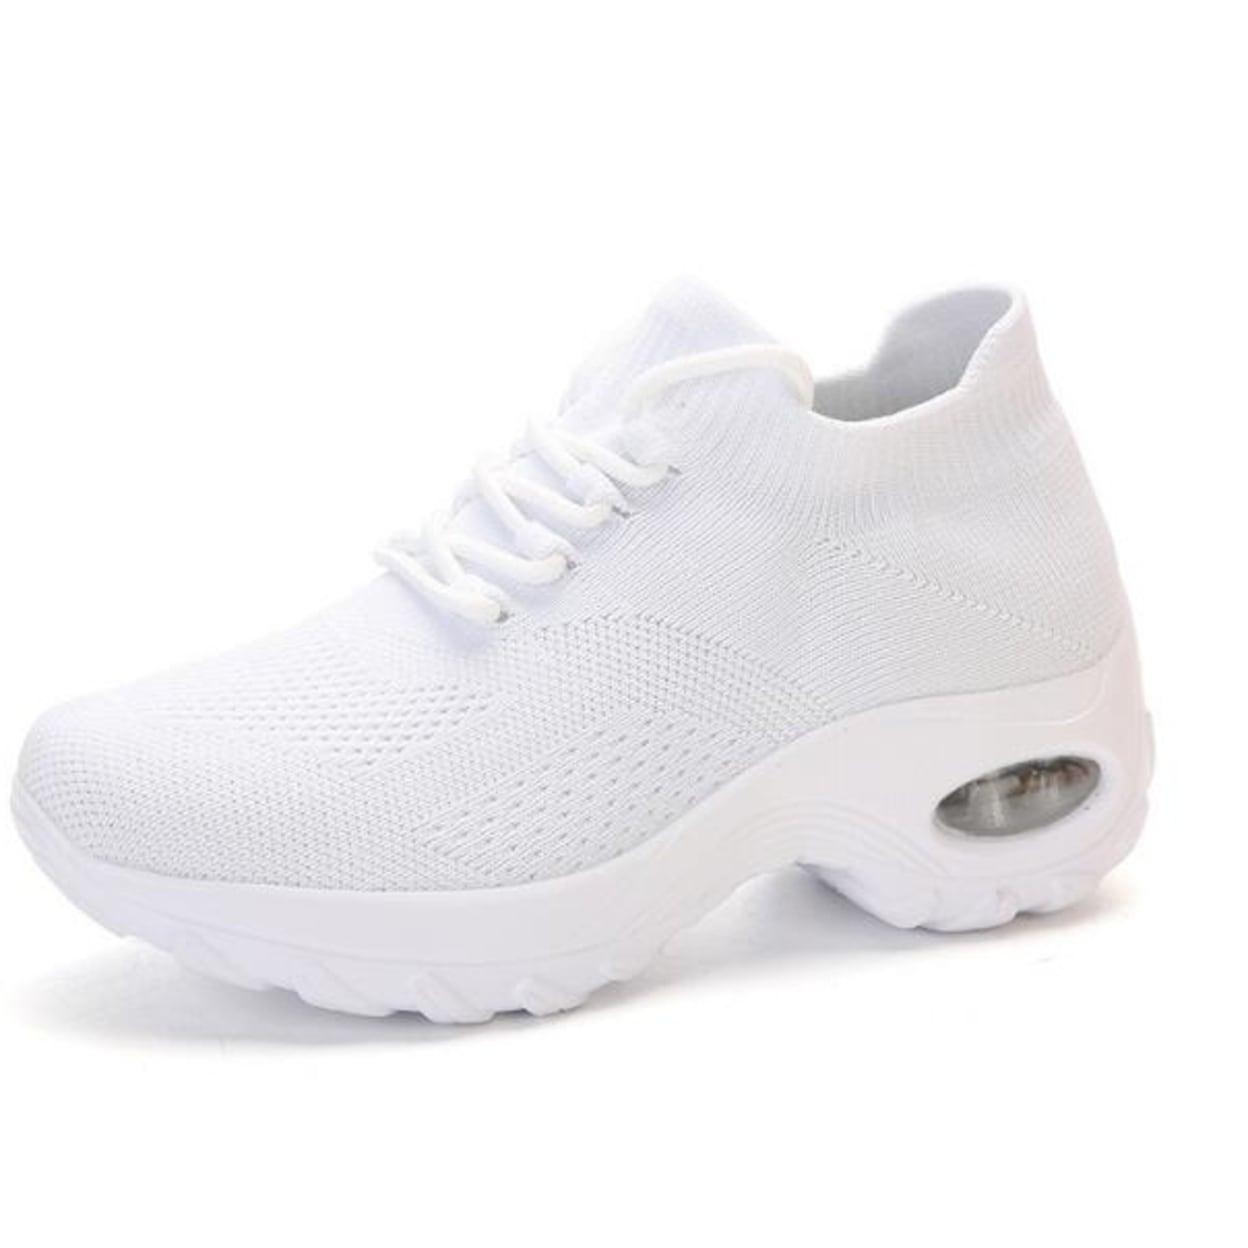 Platform Tennis Shoes Walking Sneakers